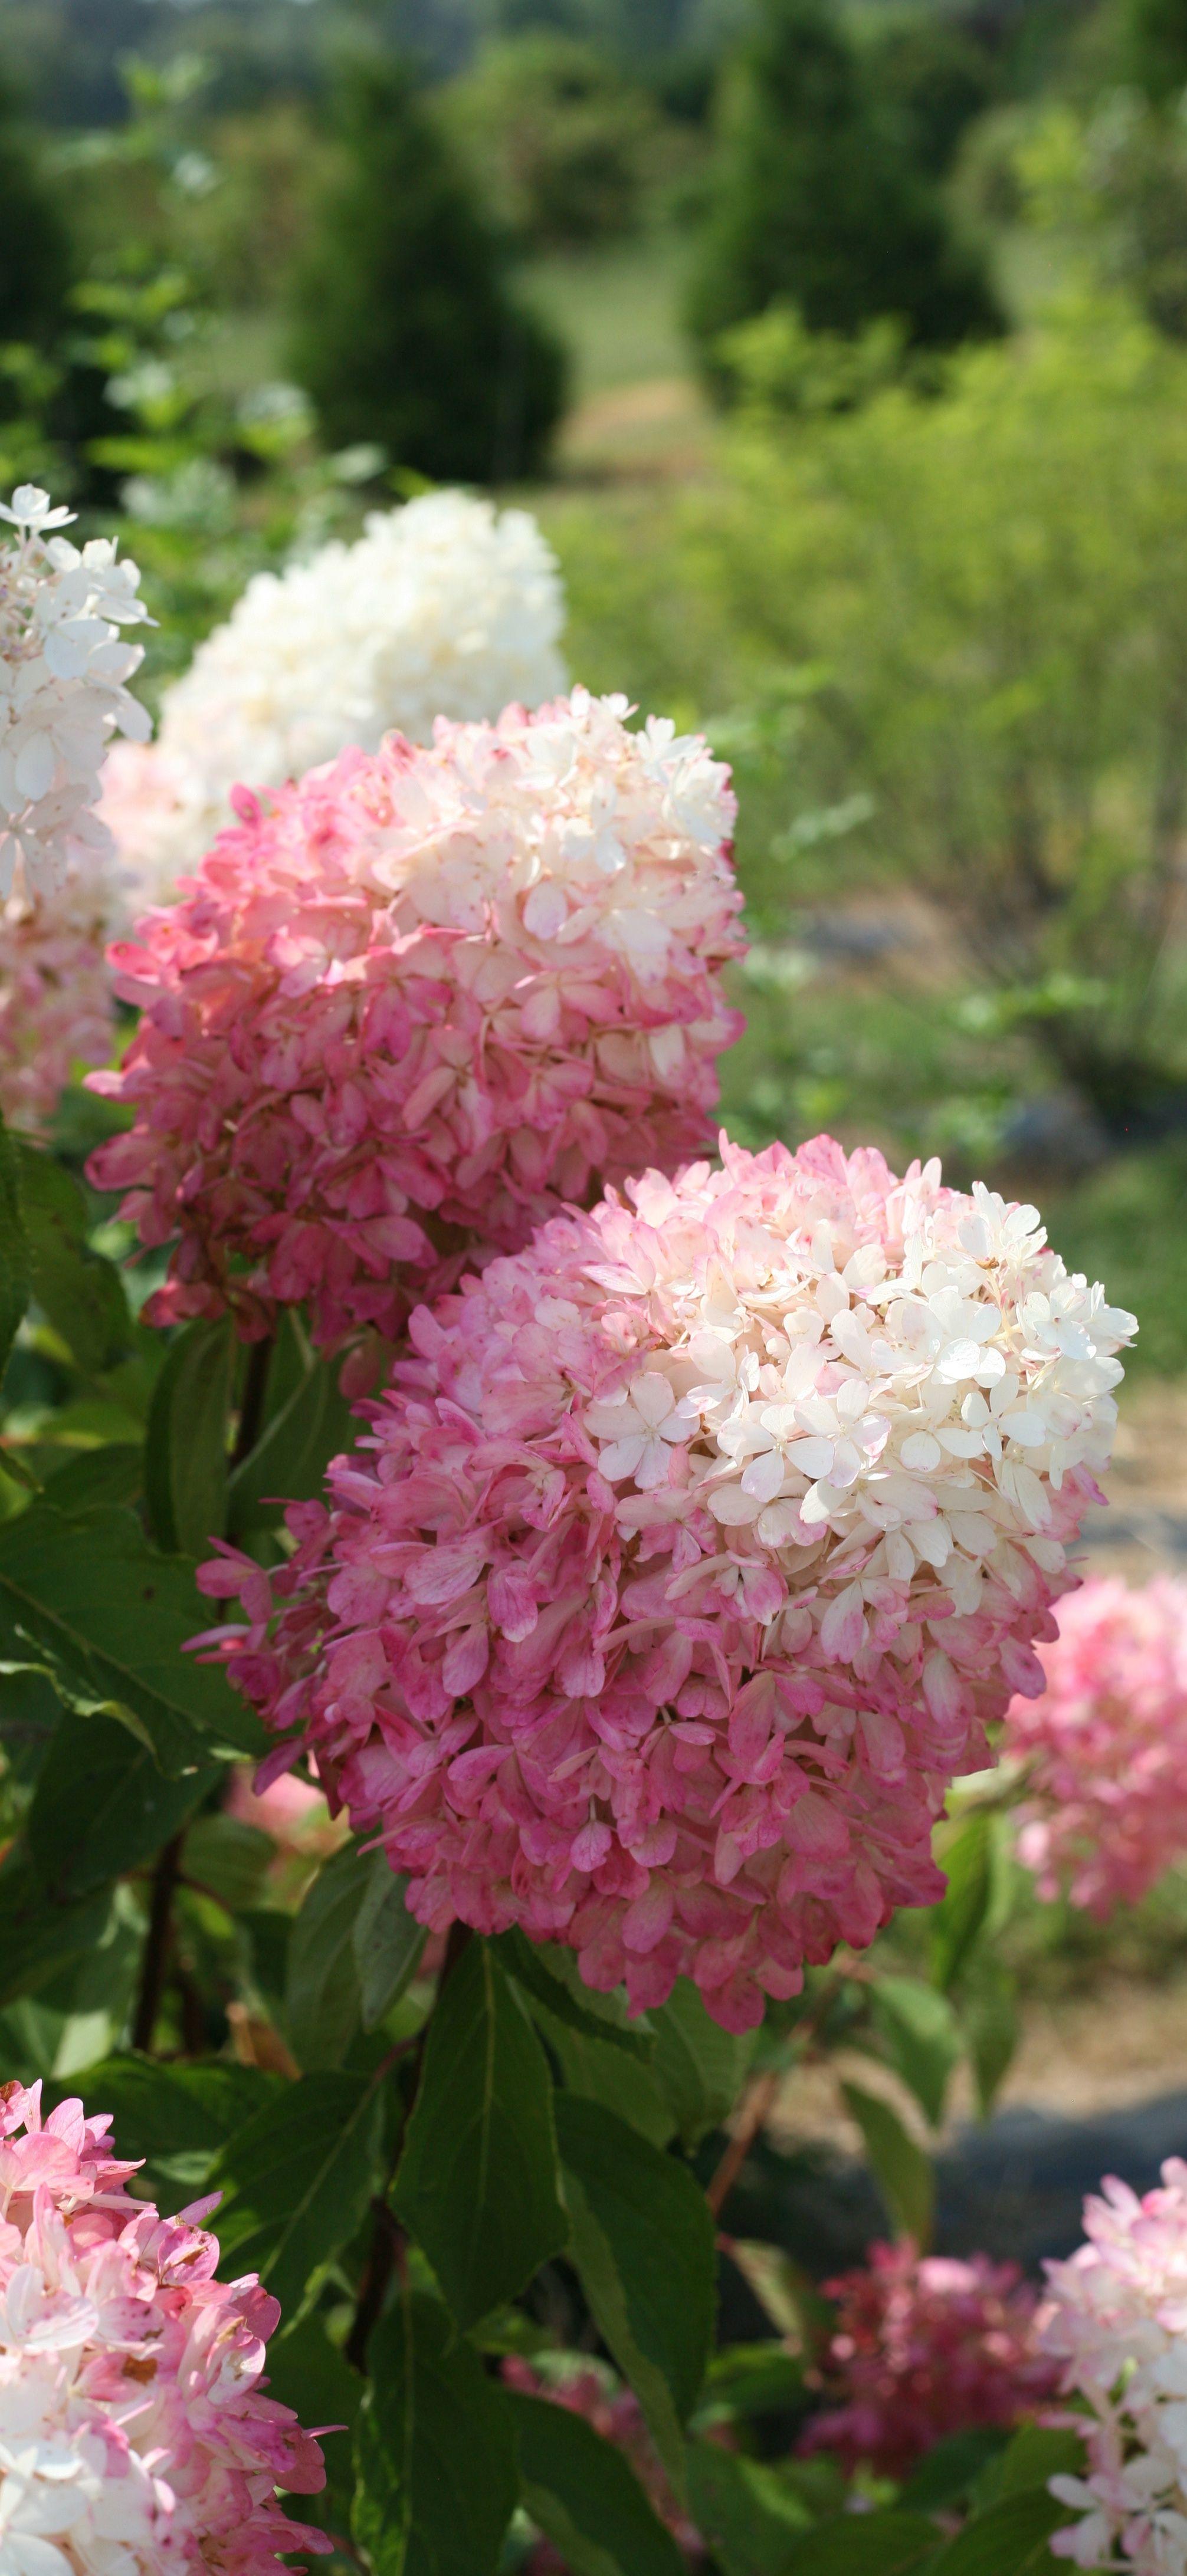 Zinfin Doll Panicle Hydrangea Hydrangea Paniculata Hydrangea Paniculata Hardy Hydrangea Bonsai Flower